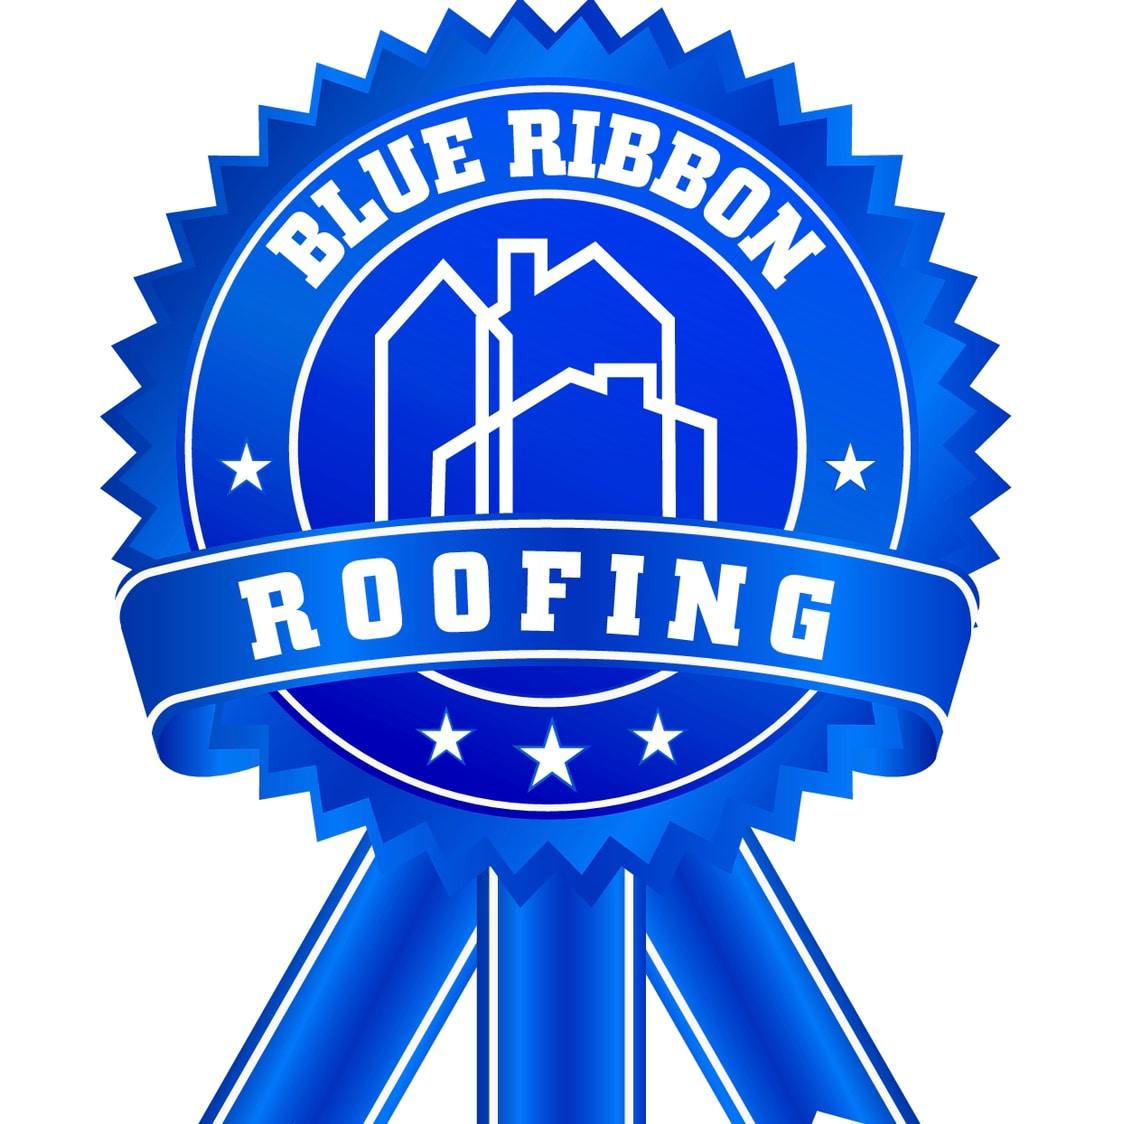 Blue Ribbon Roofing LLC